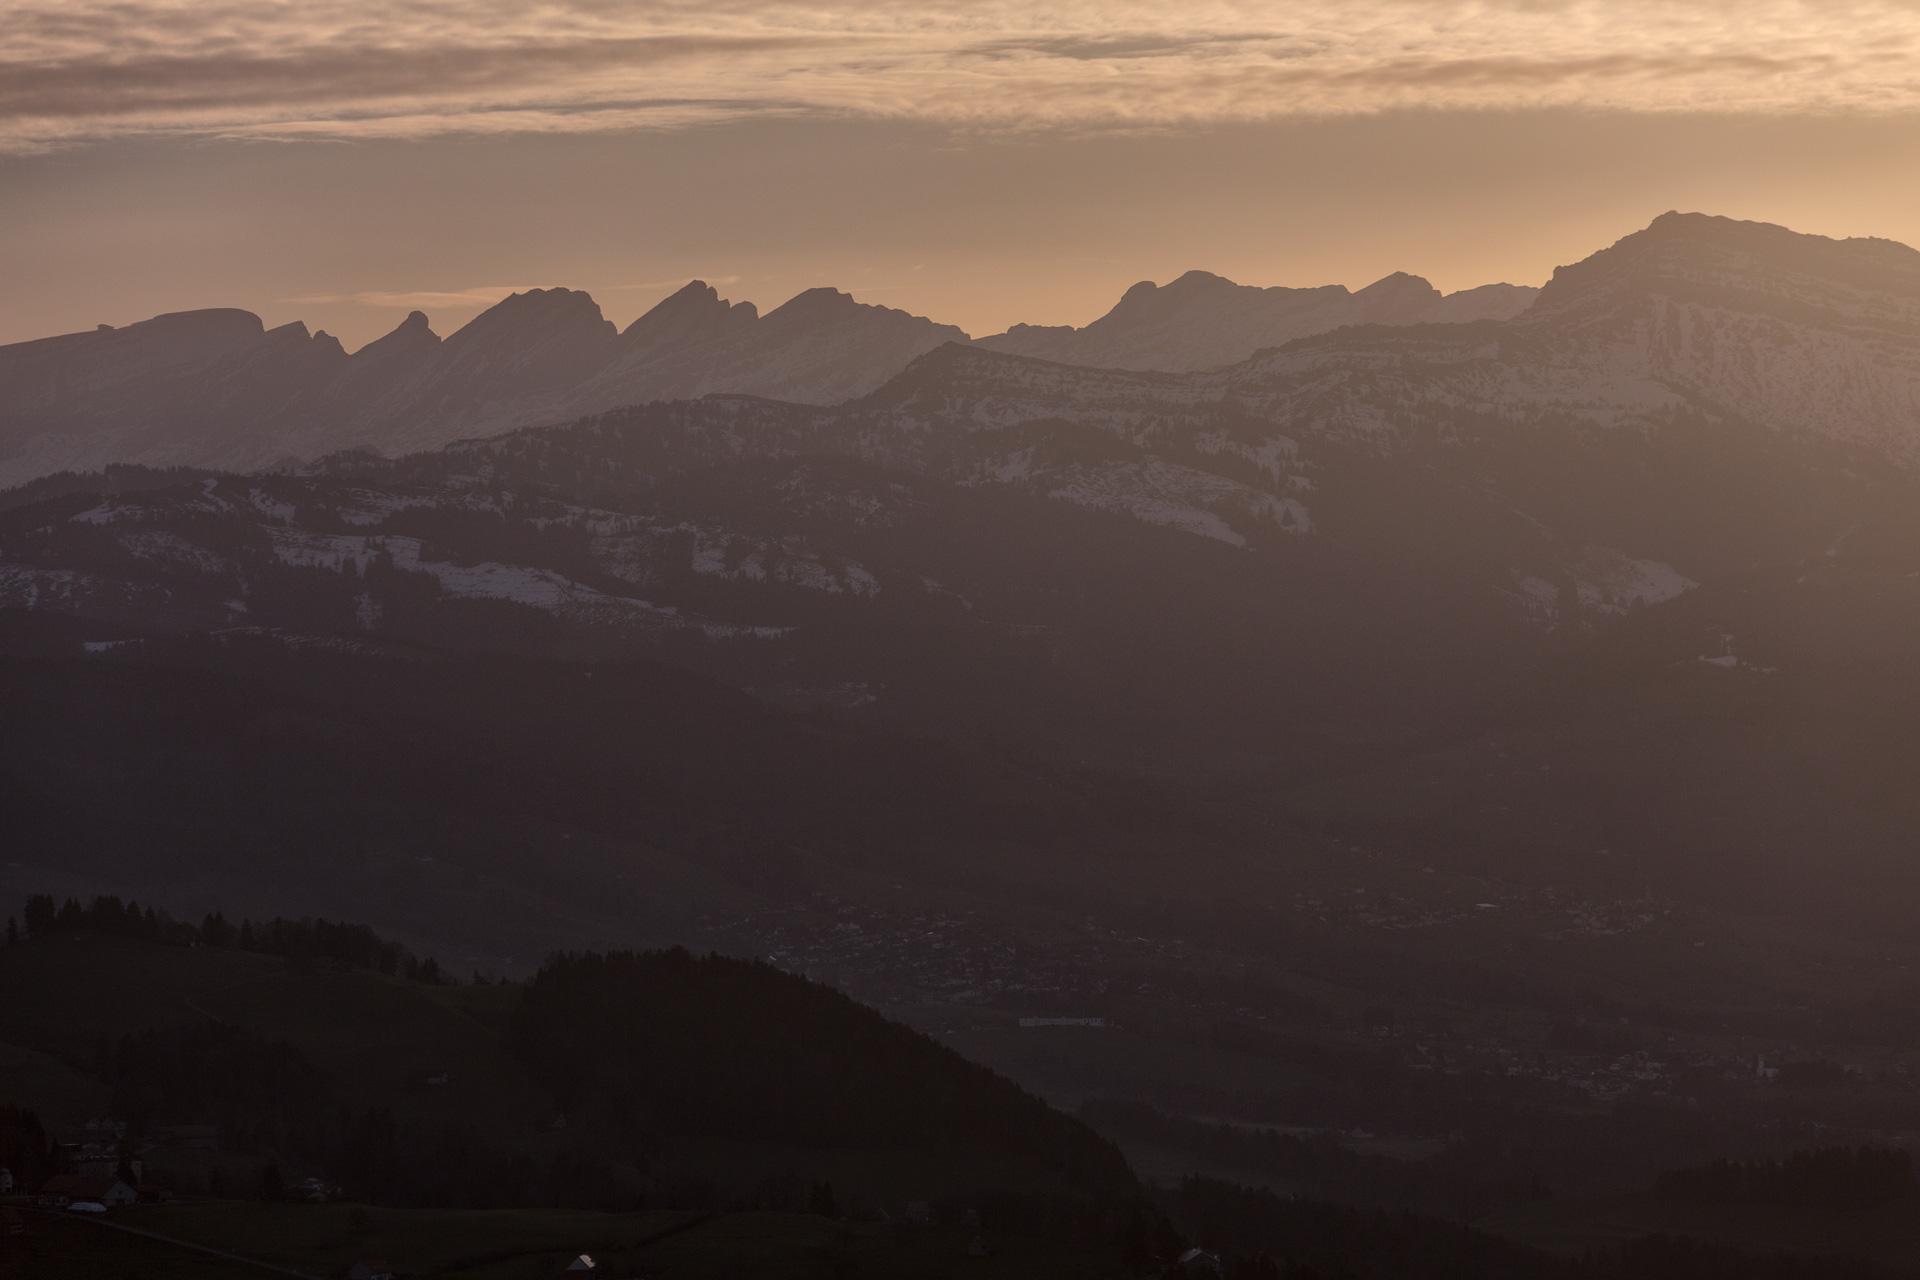 Sonnenaufgang-Bachtelturm_20151219_6011-1